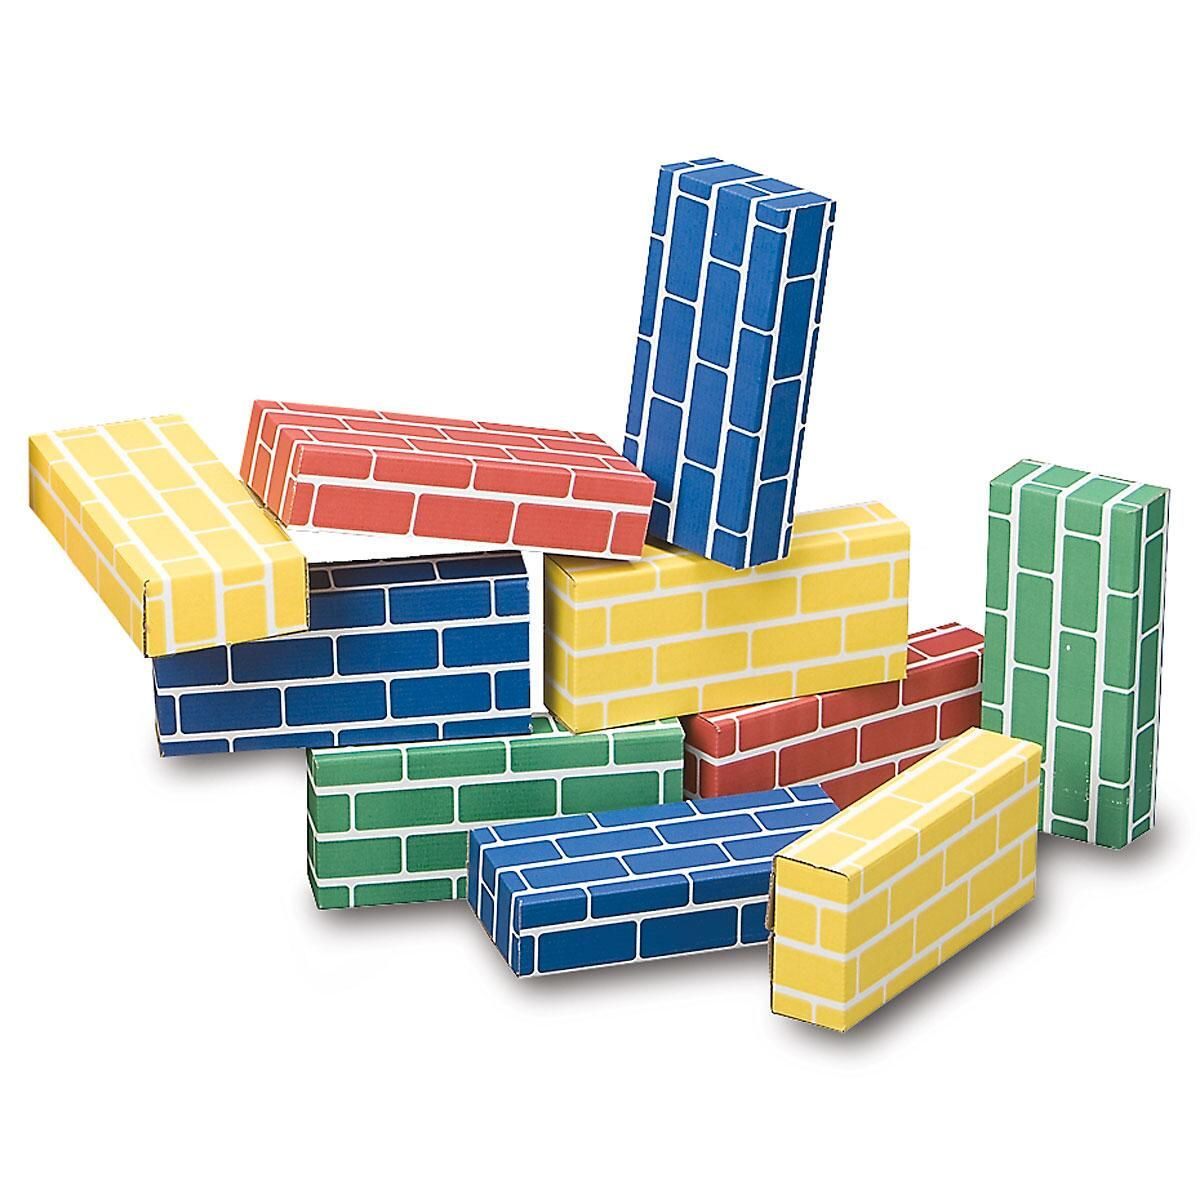 Primary Building Bricks - Set of 24